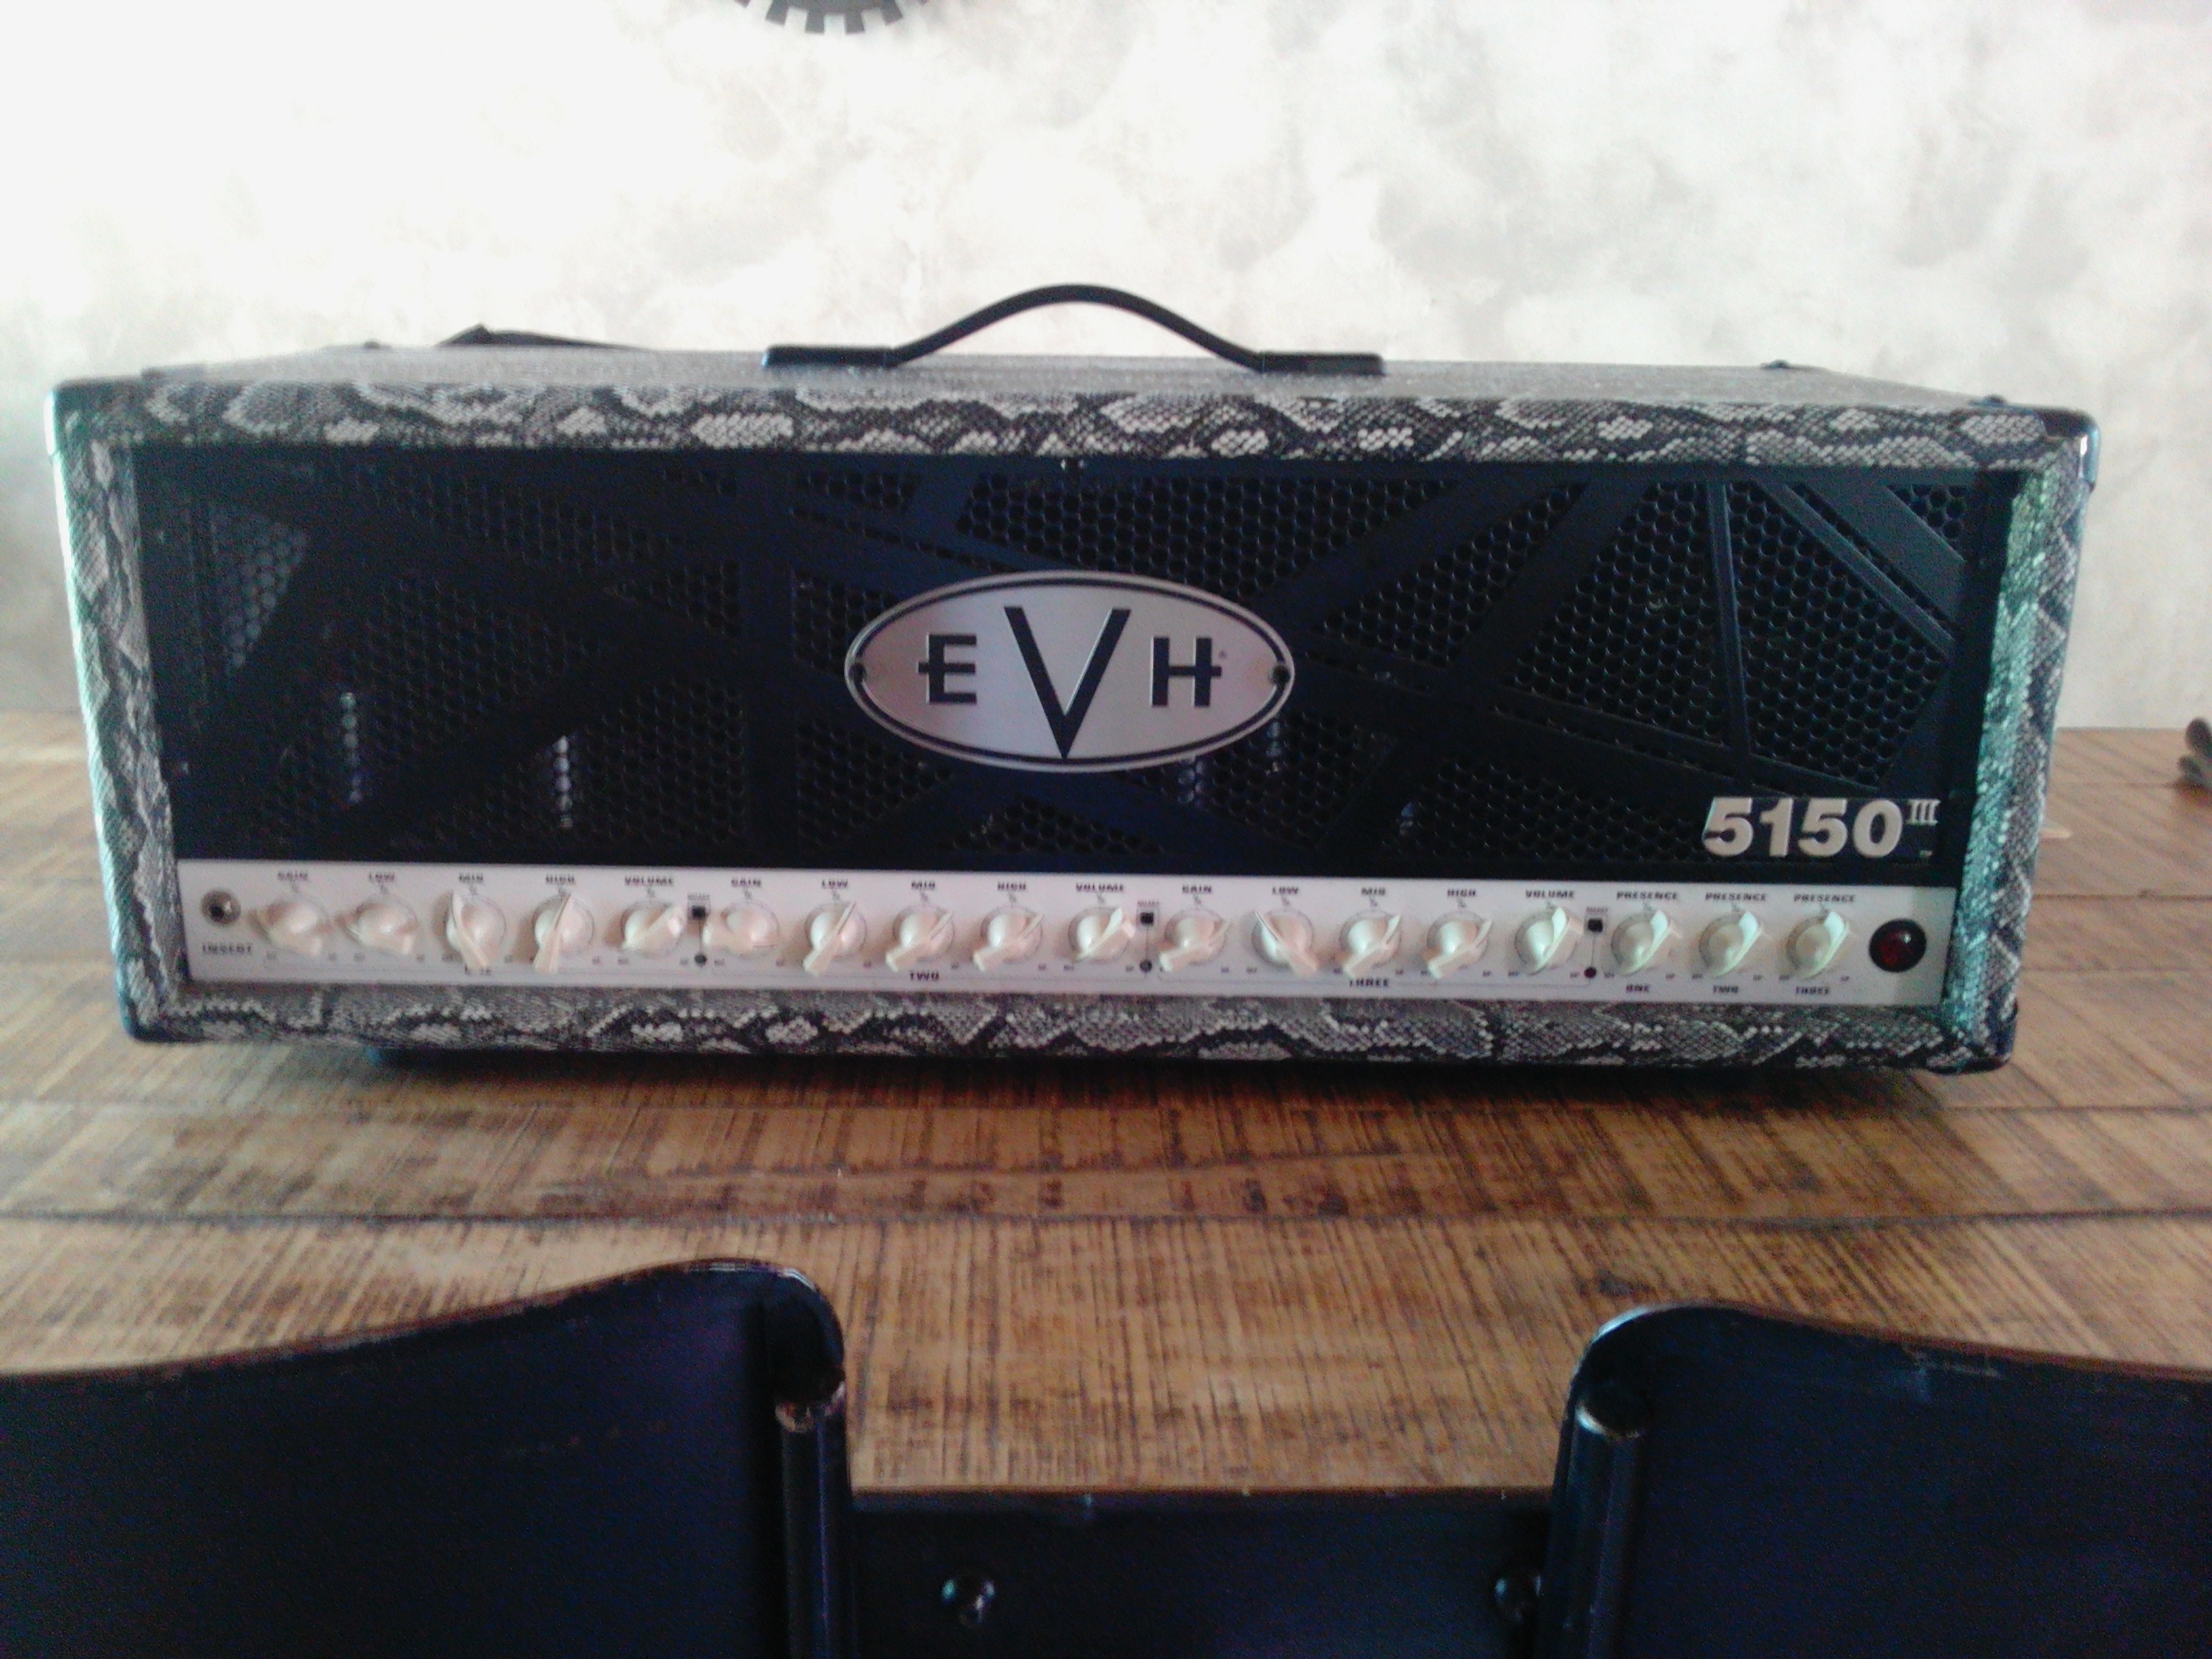 evh 5150 iii 100w head image 1532360 audiofanzine. Black Bedroom Furniture Sets. Home Design Ideas